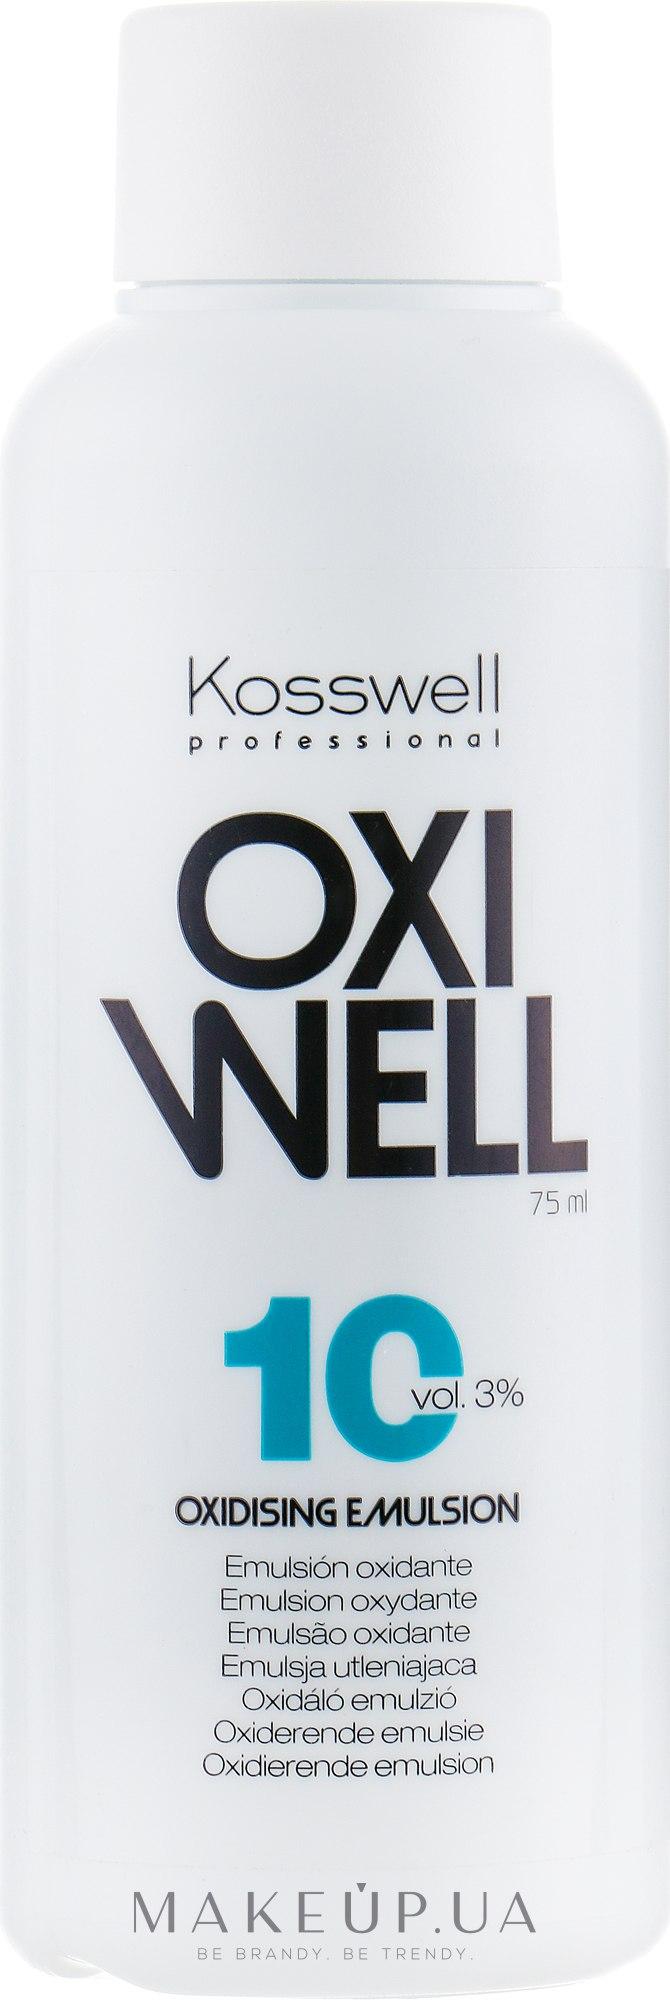 Окислительная эмульсия, 3% - Kosswell Professional Equium Oxidizing Emulsion Oxiwell 3% 10vol — фото 75ml